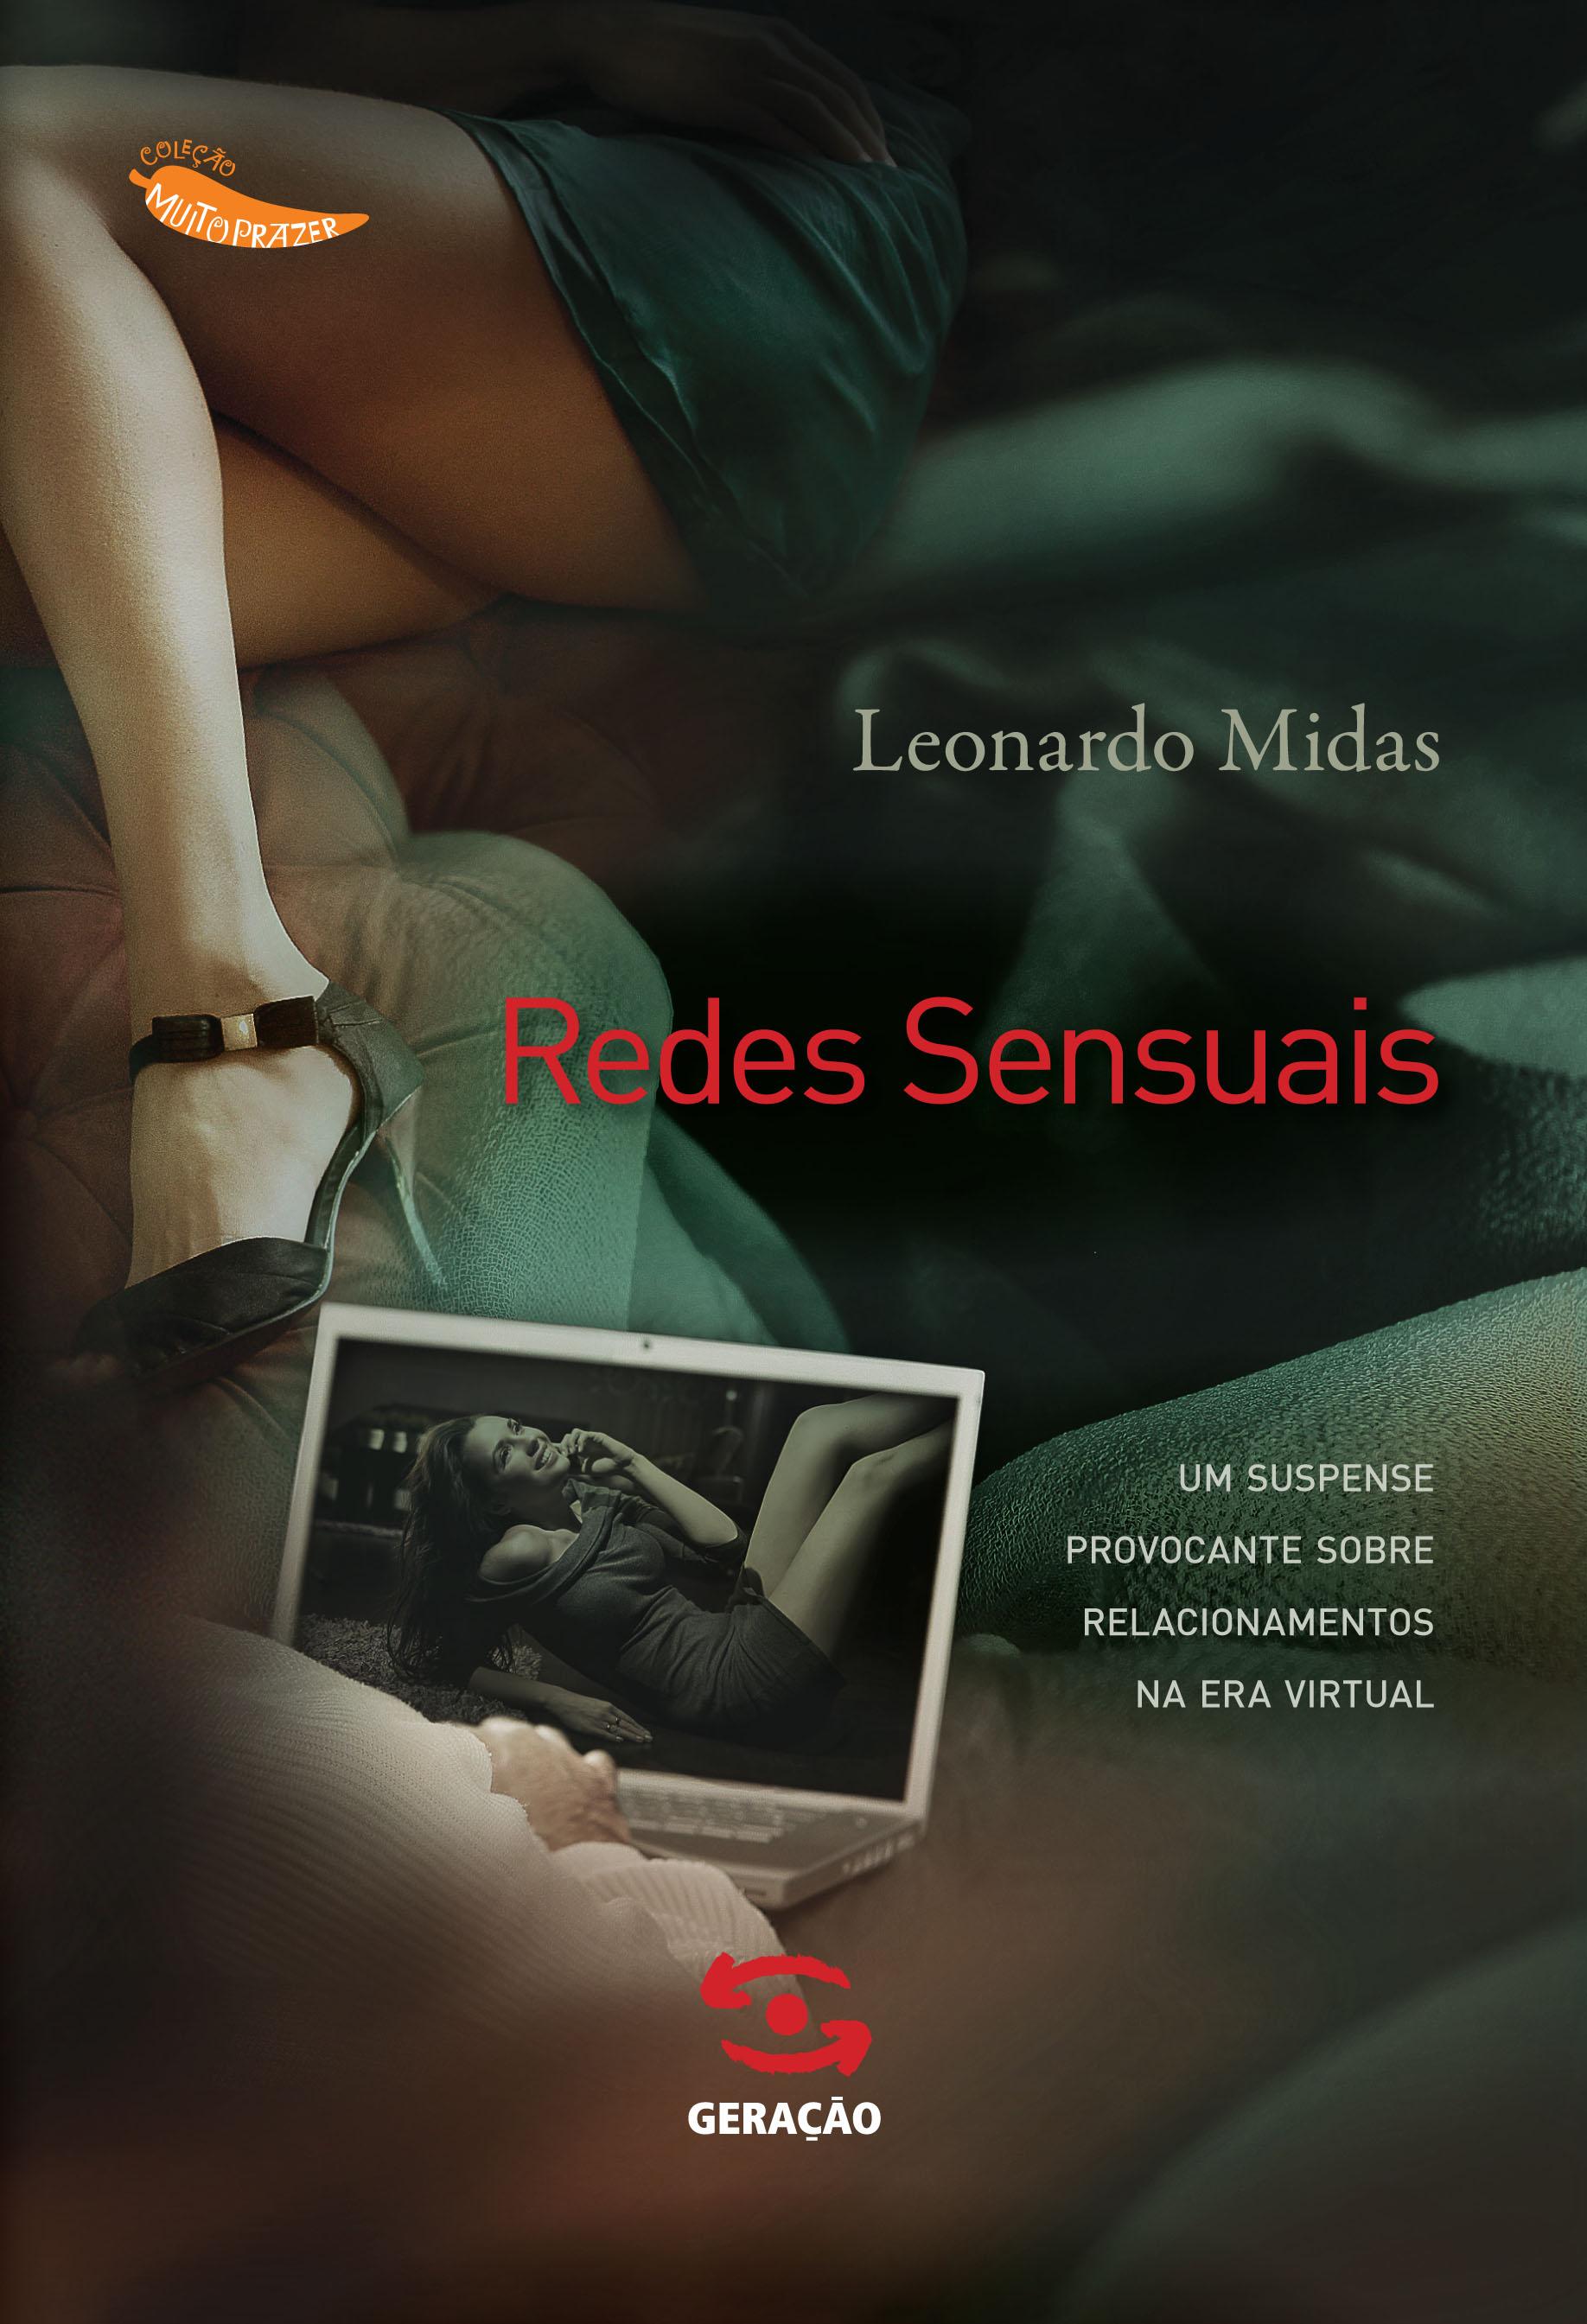 Redes_Sensuais